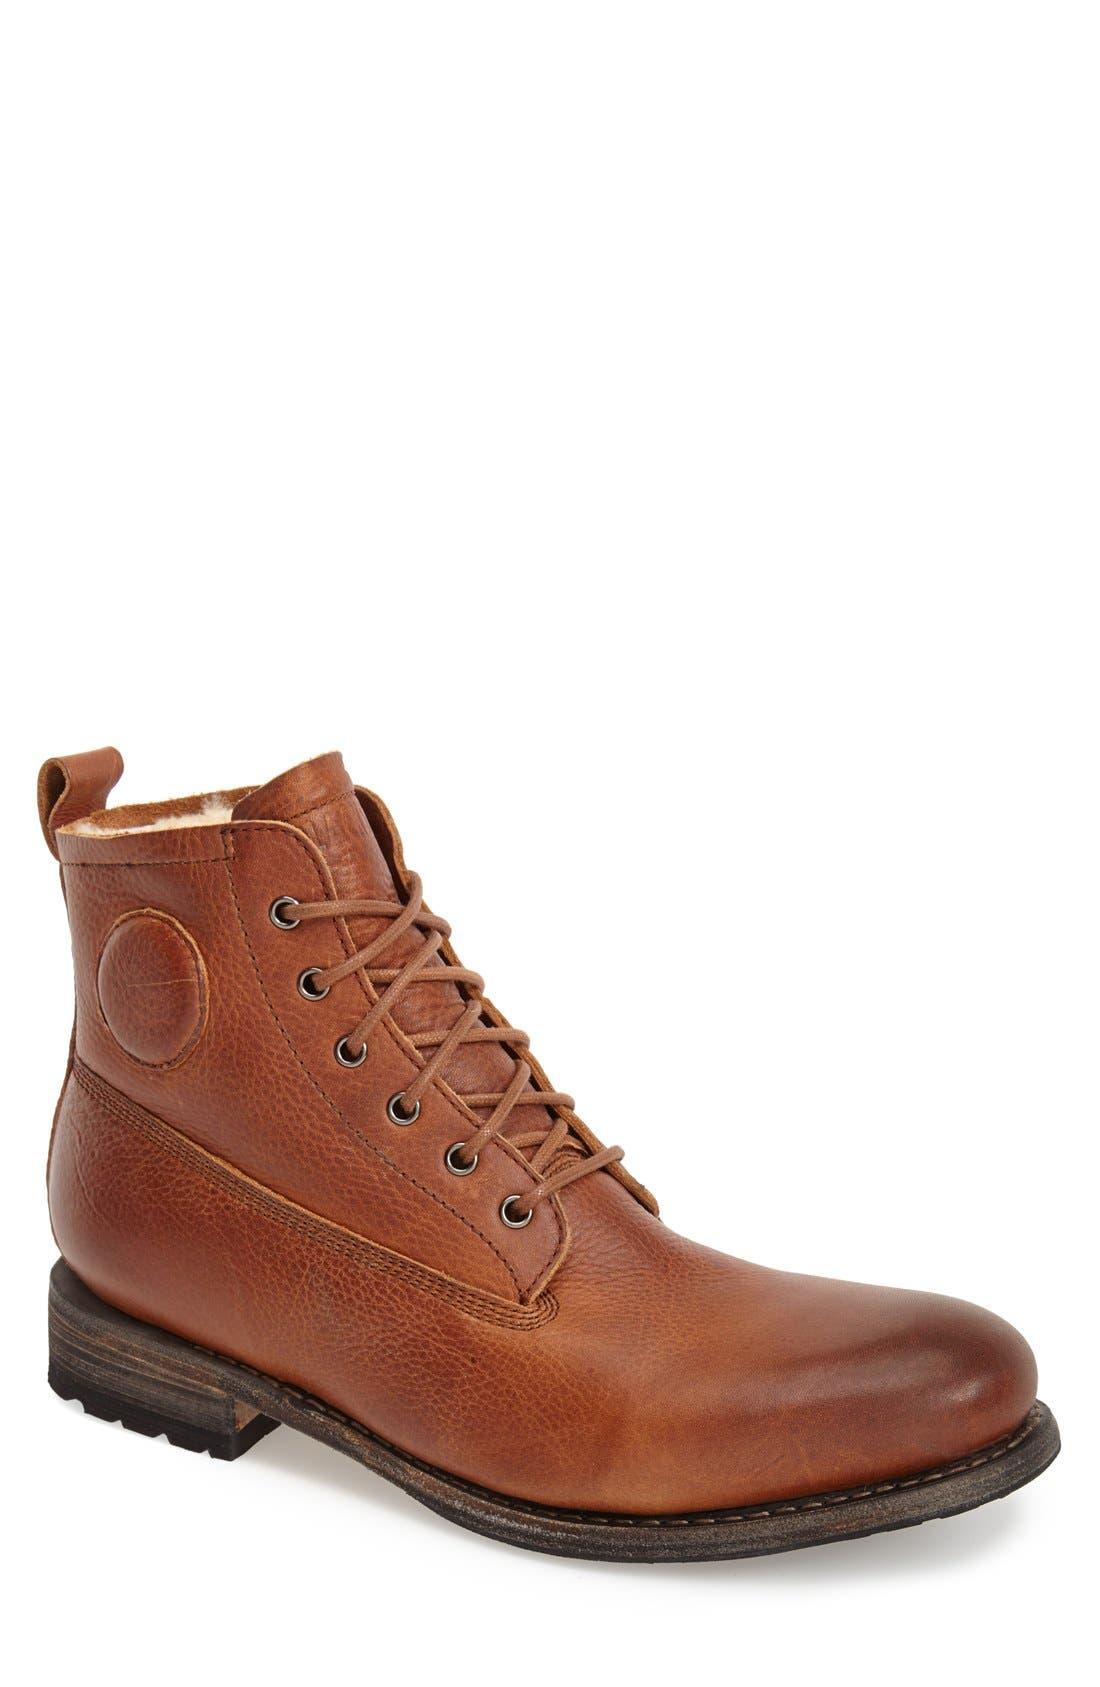 'Gull' Plain Toe Boot,                         Main,                         color, CUOIO